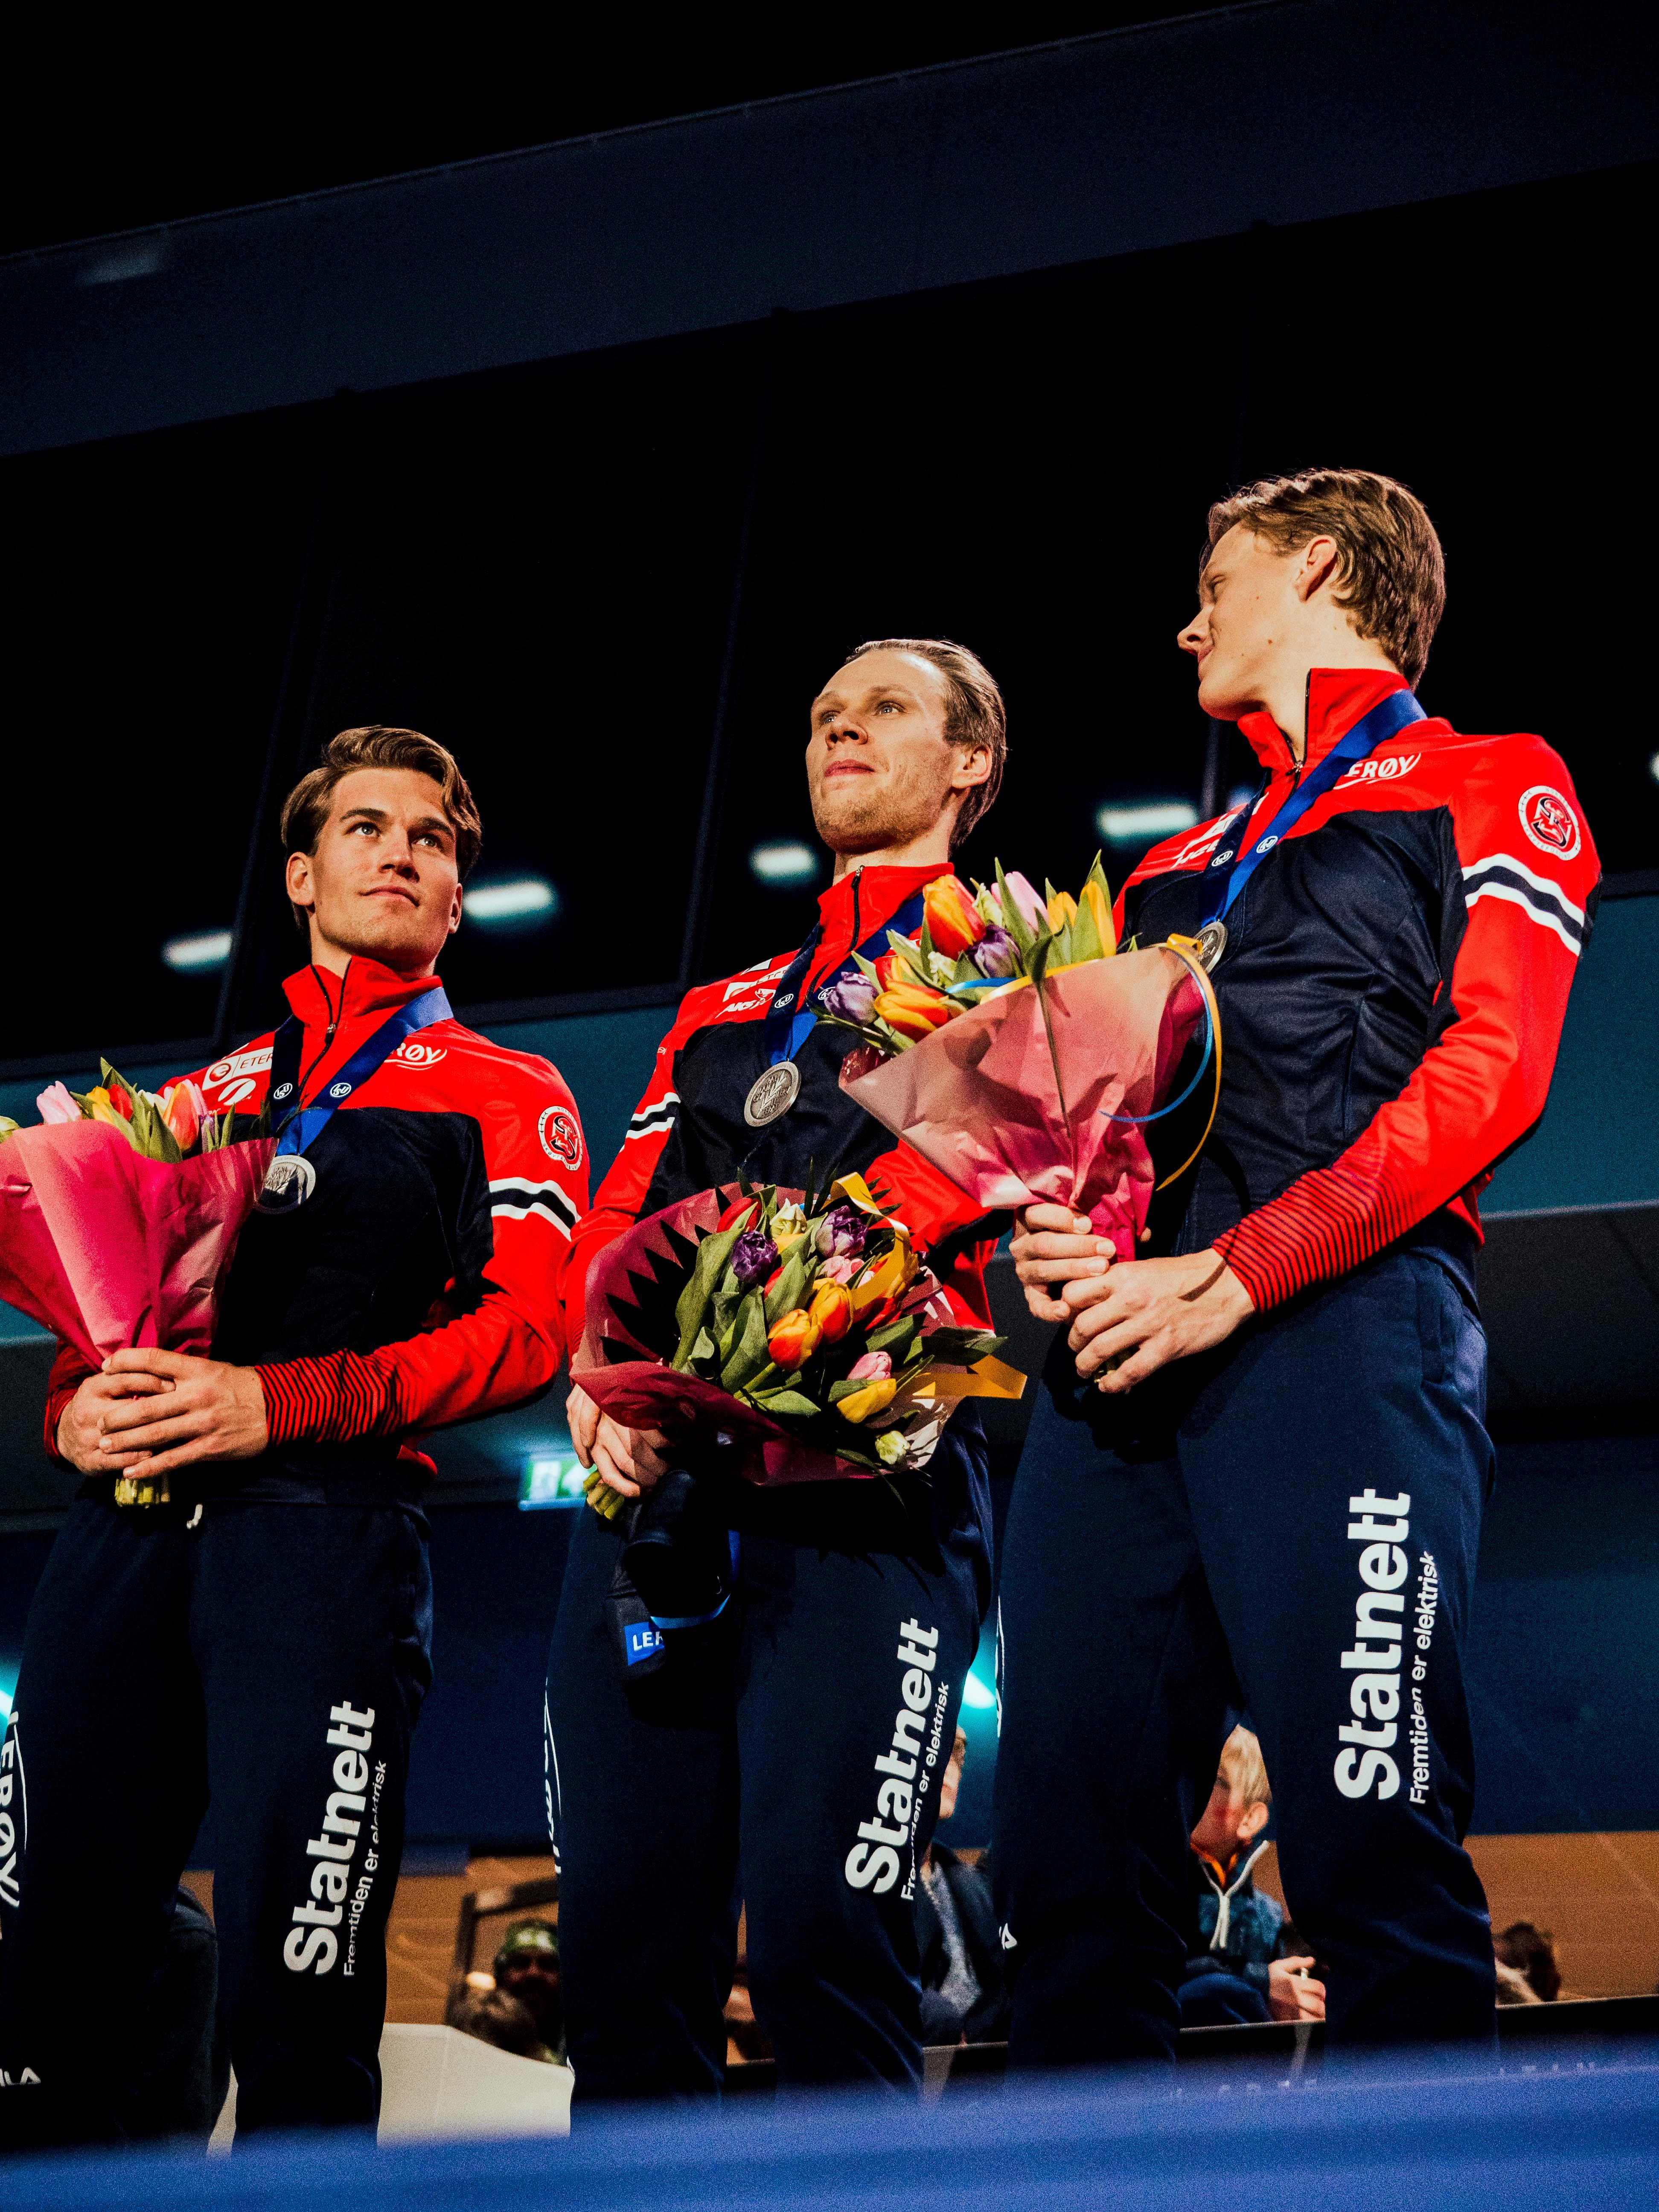 Farstad, Lorentzen, Magnussen, European Championships 2020